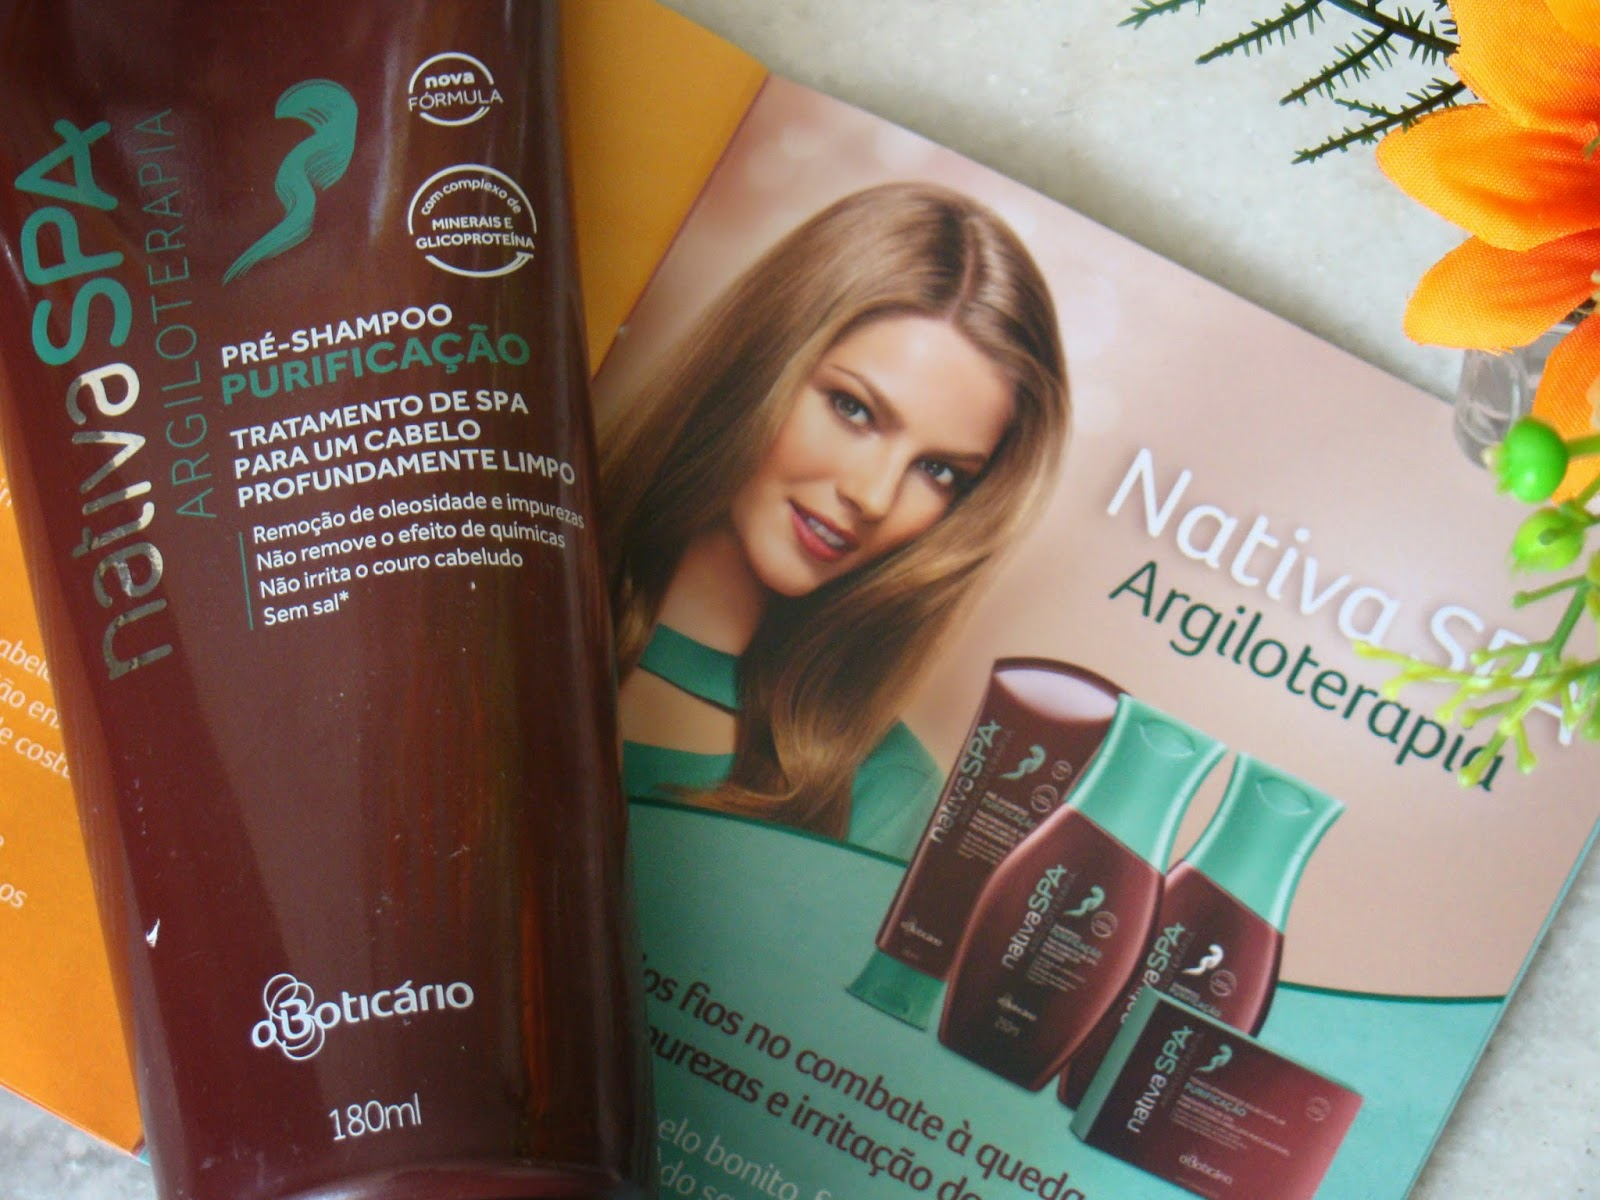 Nativa SPA: Tratamento personalizado para cabelos